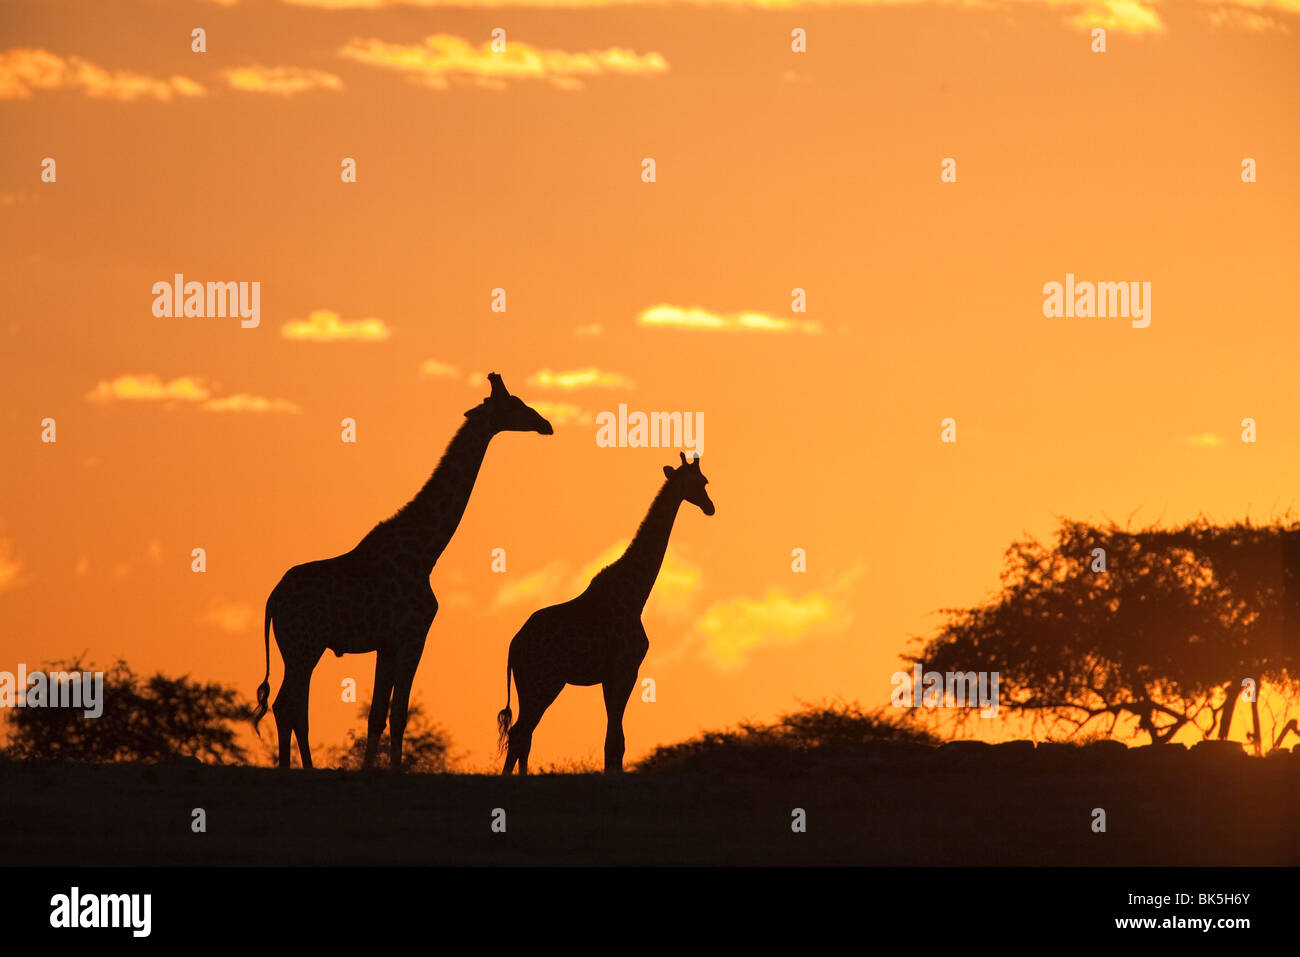 Les Girafes (Giraffa camelopardalis), en silhouette au coucher du soleil, Parc National d'Etosha, Namibie, Afrique Photo Stock